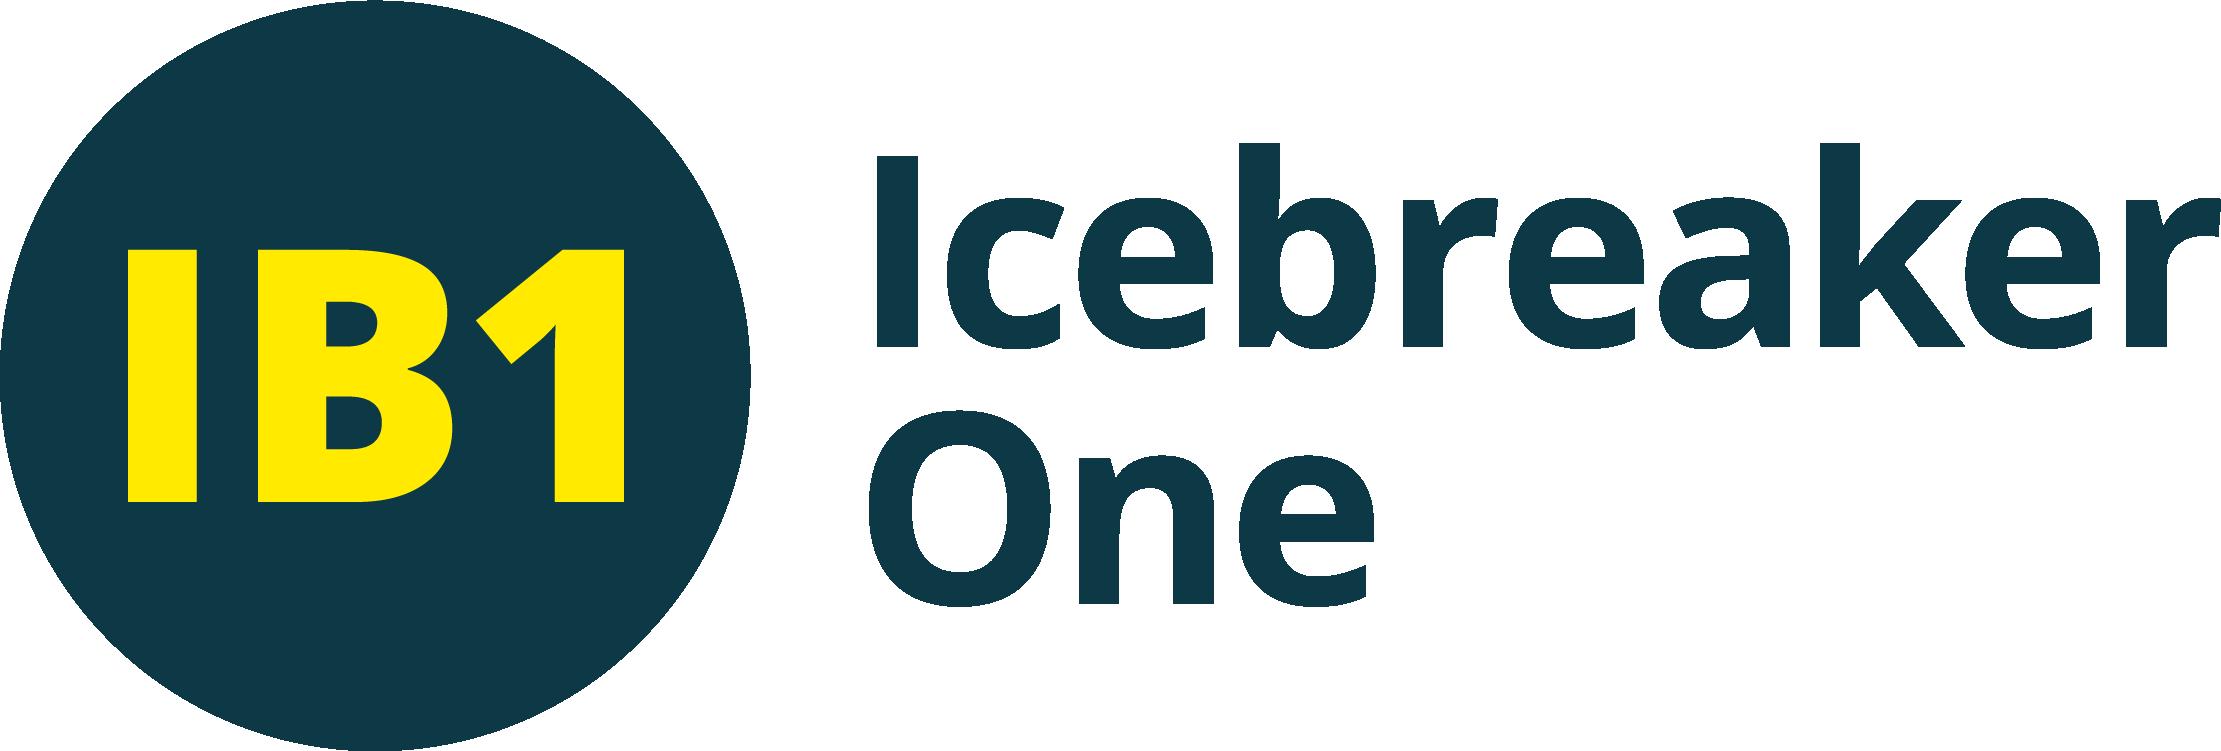 Icebreaker One